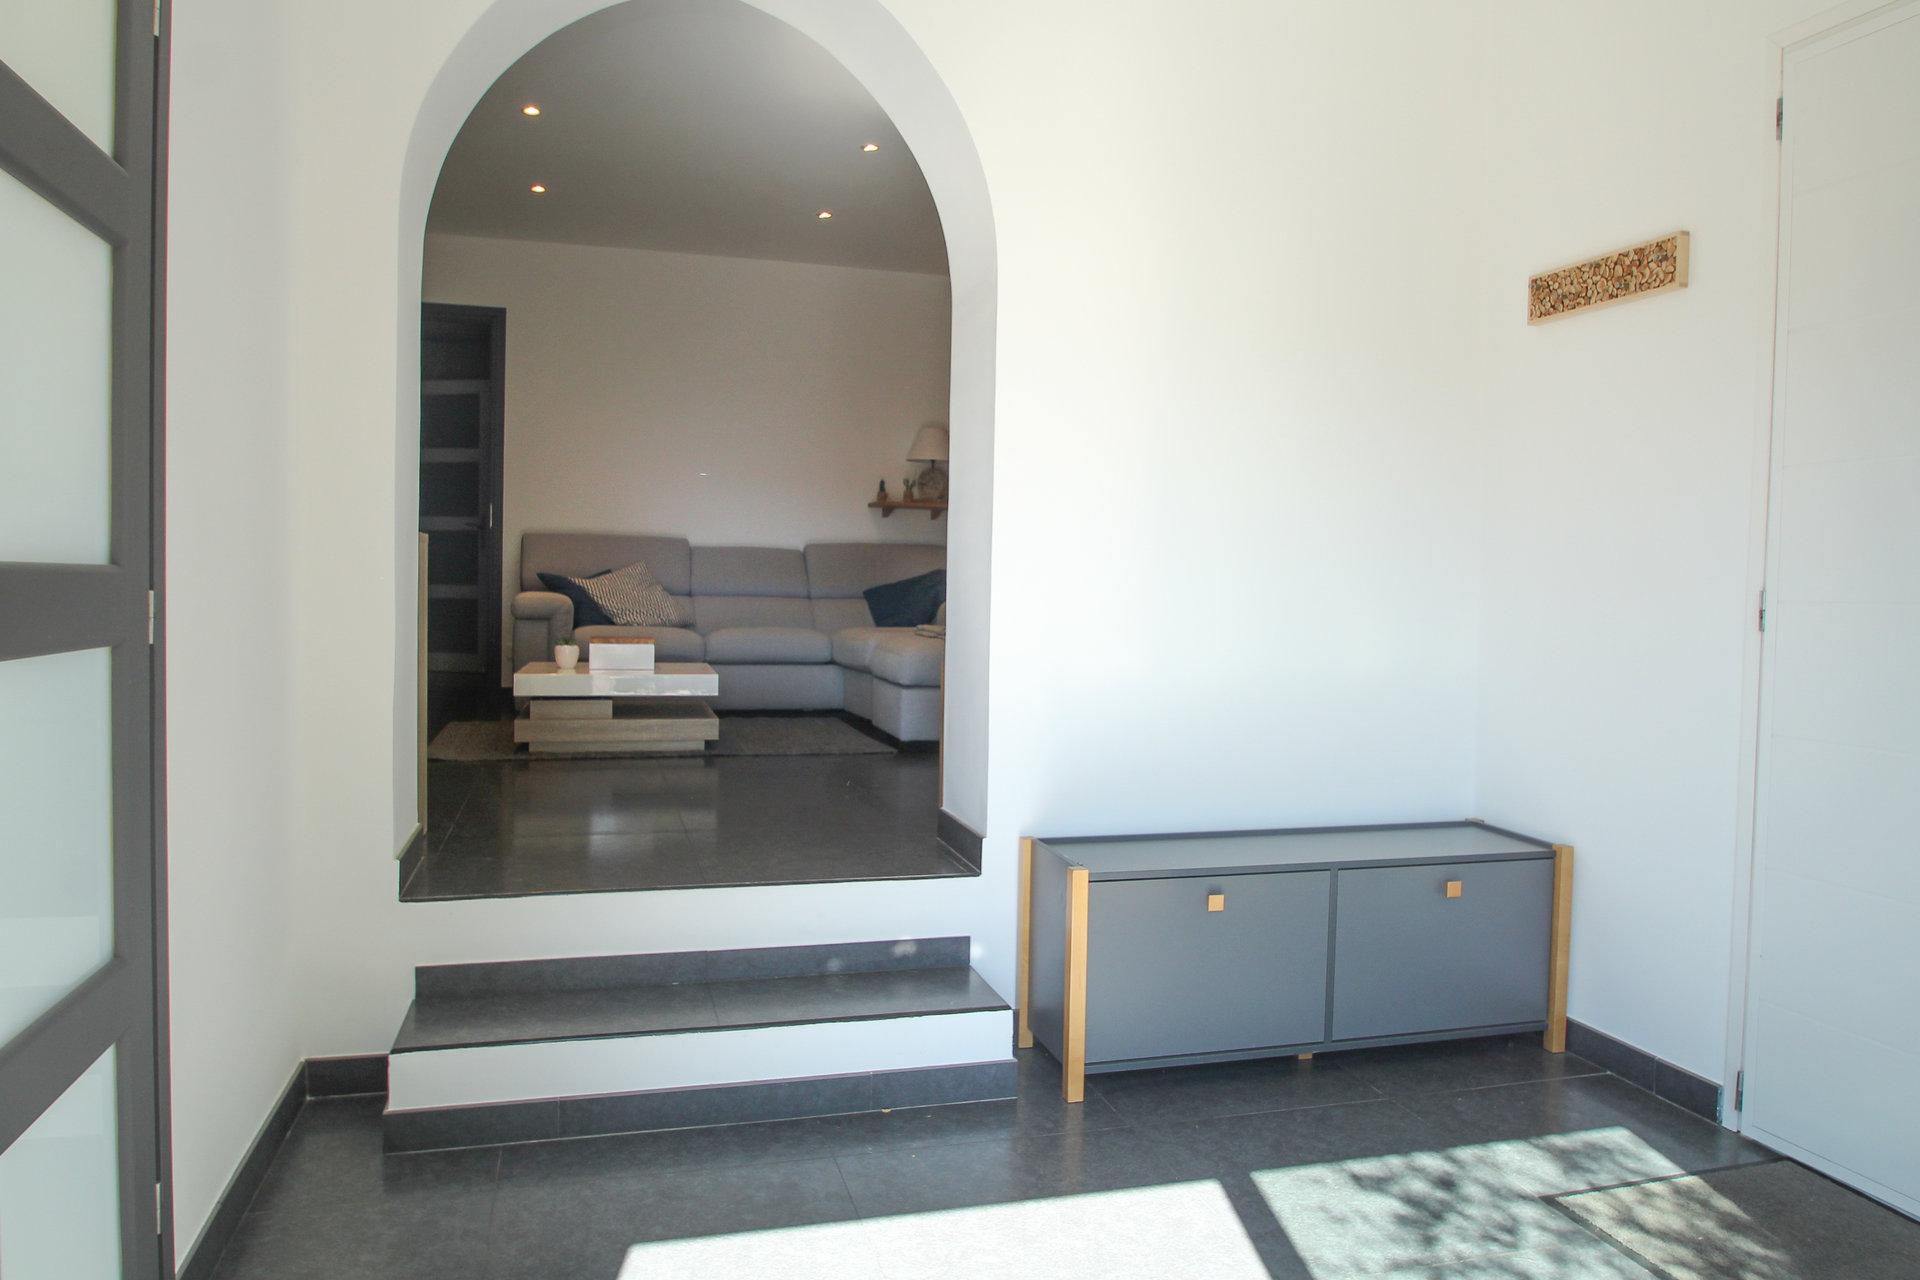 Bel appartement avec grande terrasse et vue